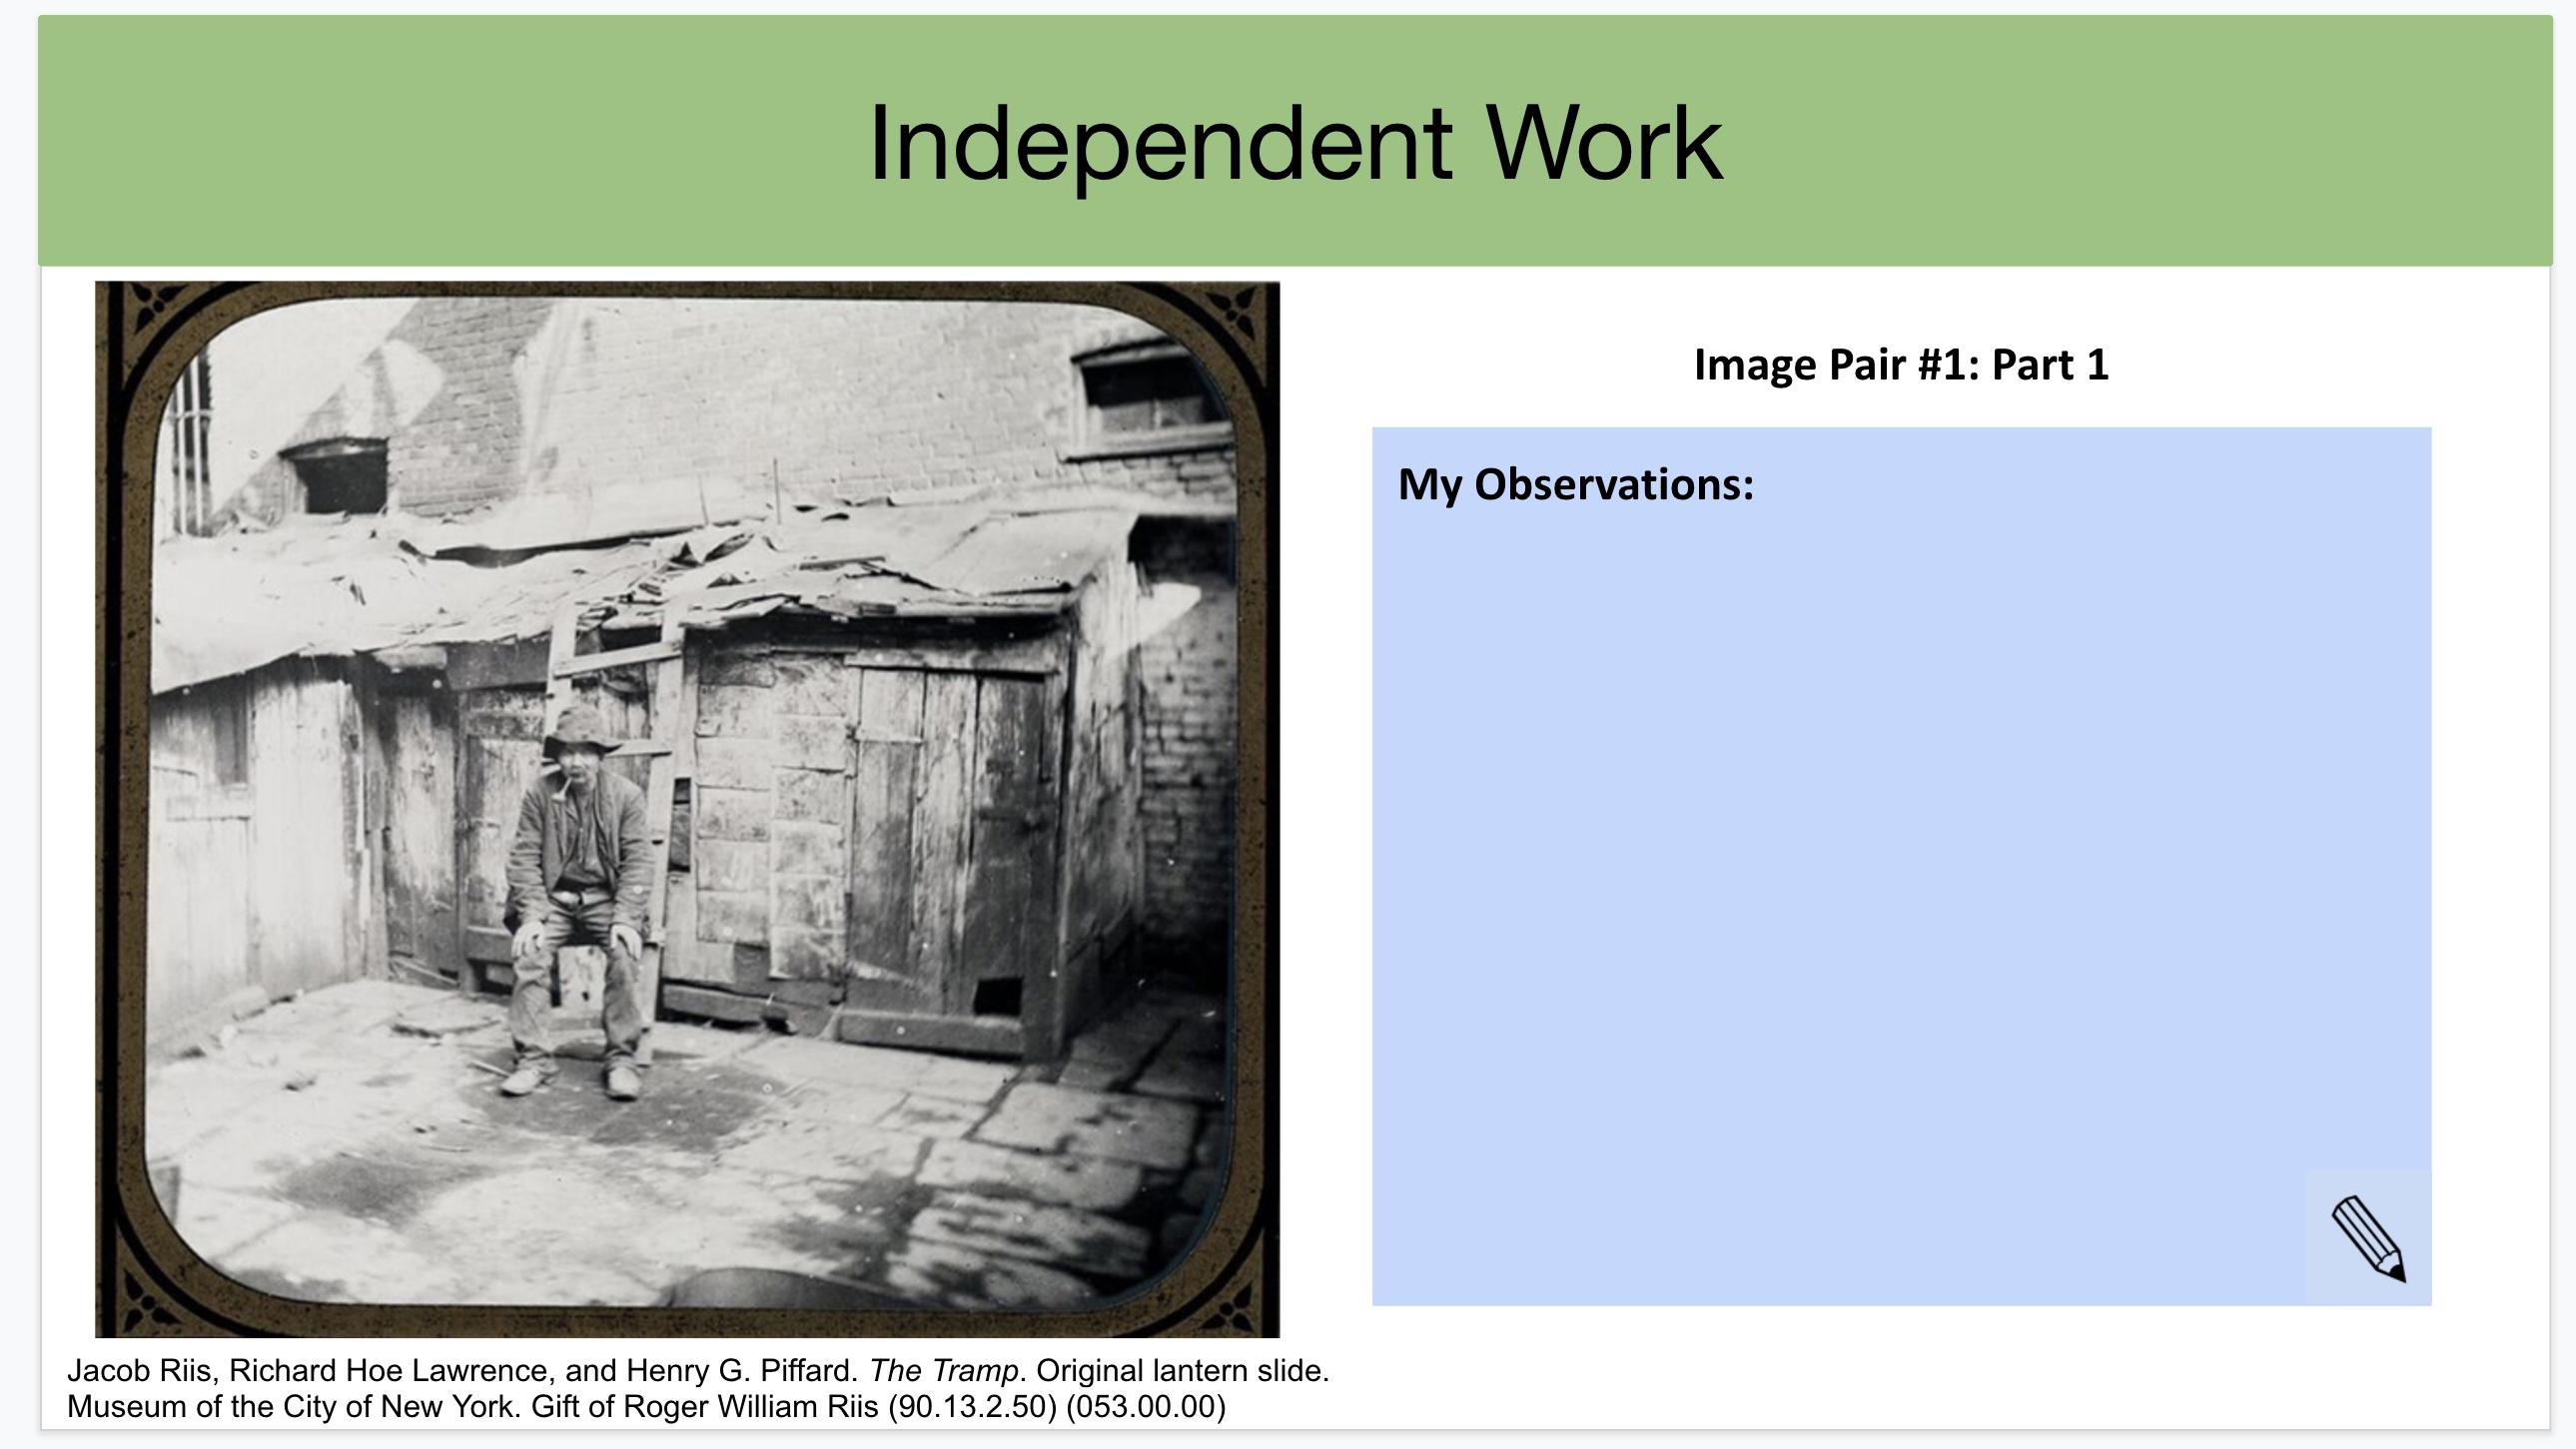 A slide from a lesson on the Progressive Era